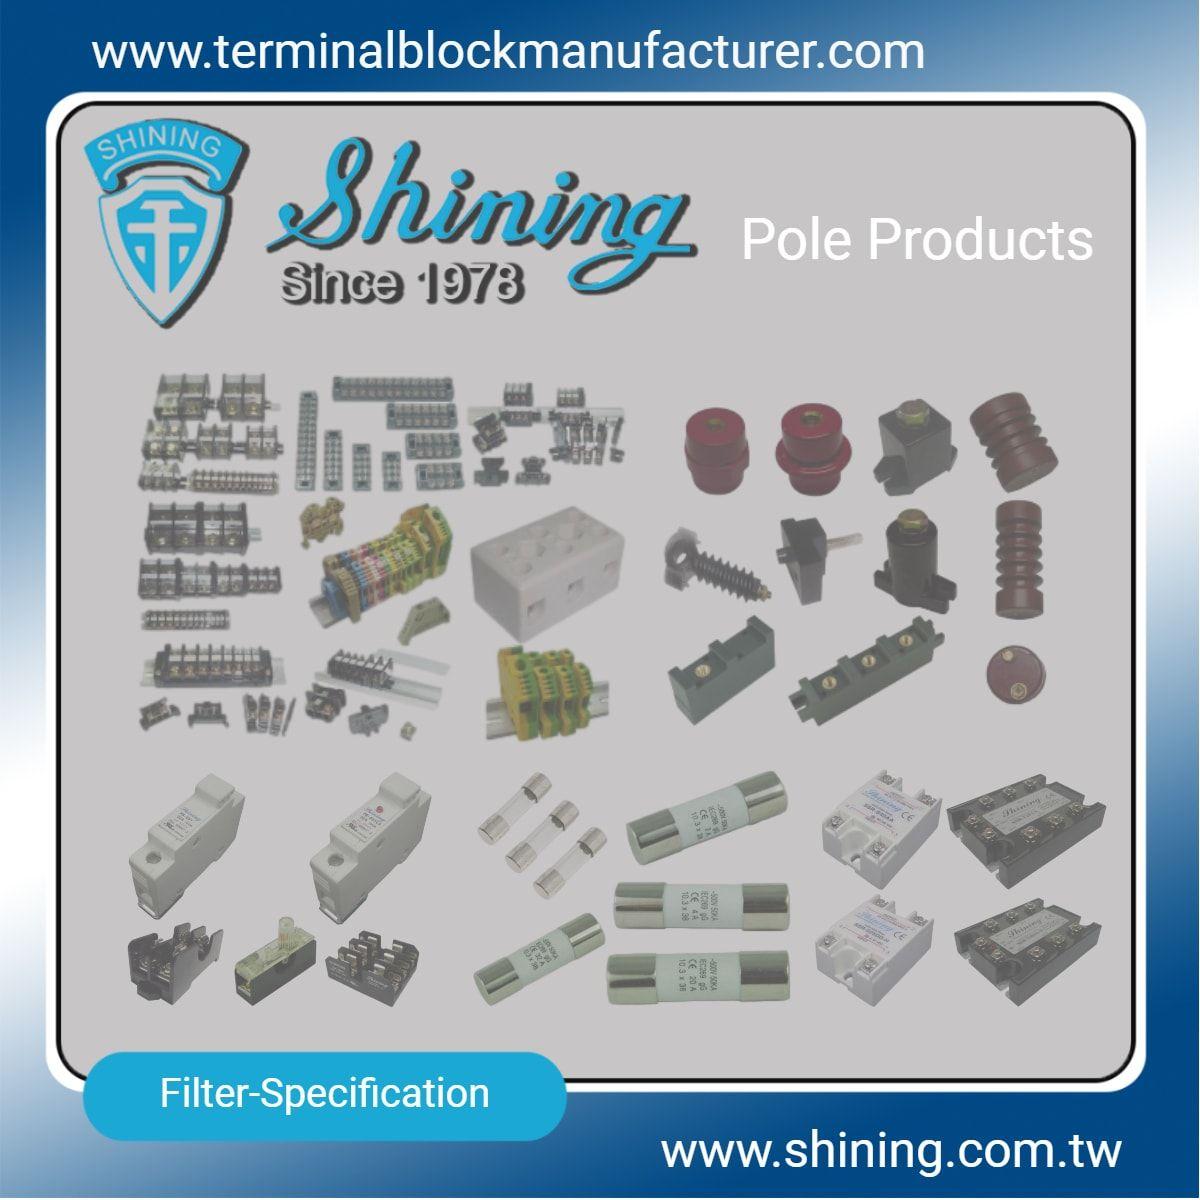 Pole Products - Terminal Blocks Solid State Relay Fuse Holder Insulators -SHINING E&E